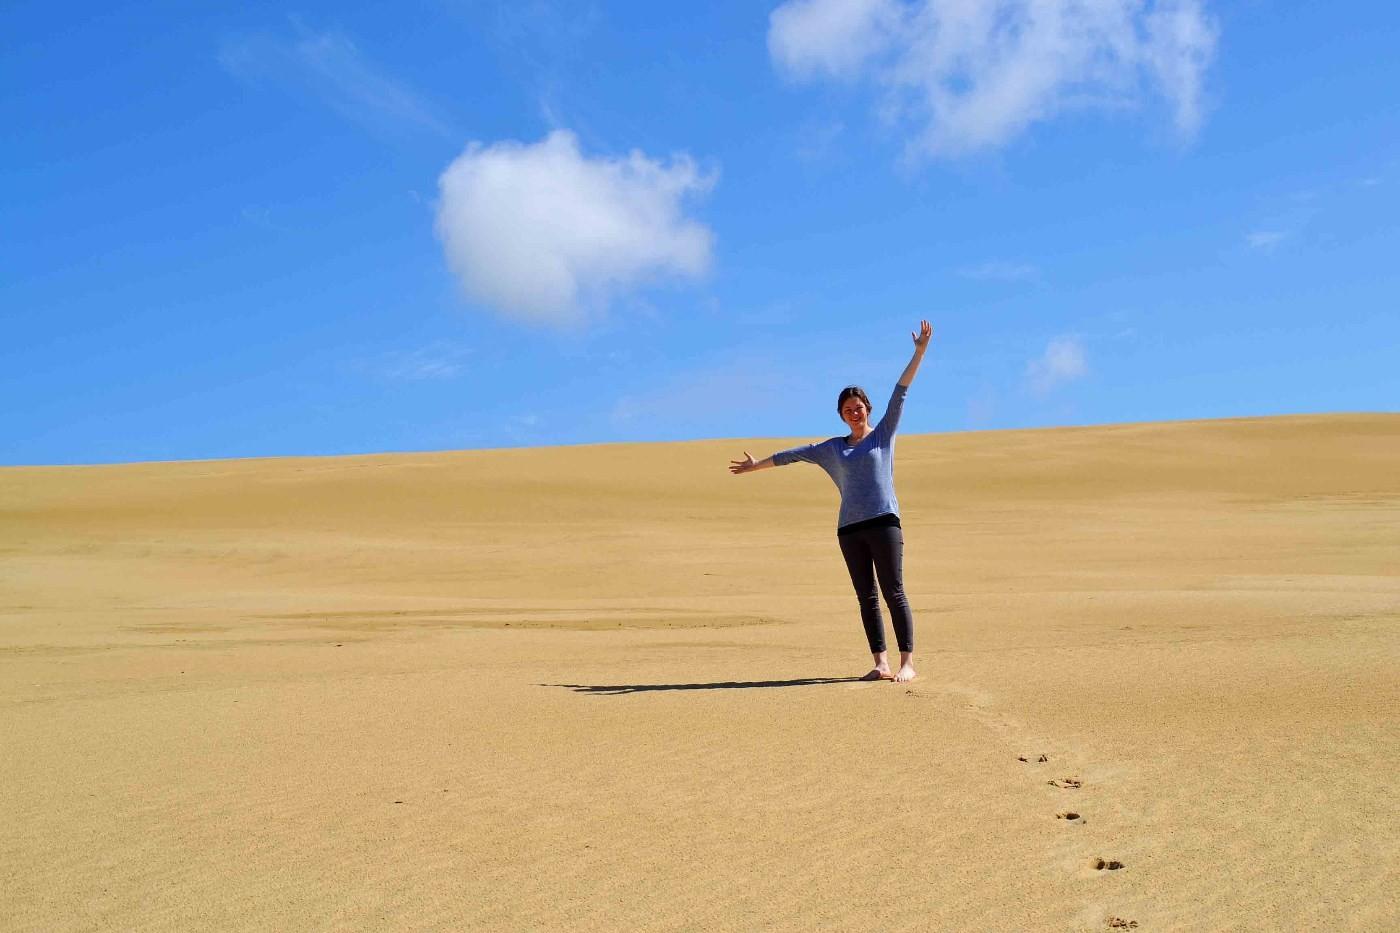 Oda prøver sanddynene.  Foto: Oda Halle